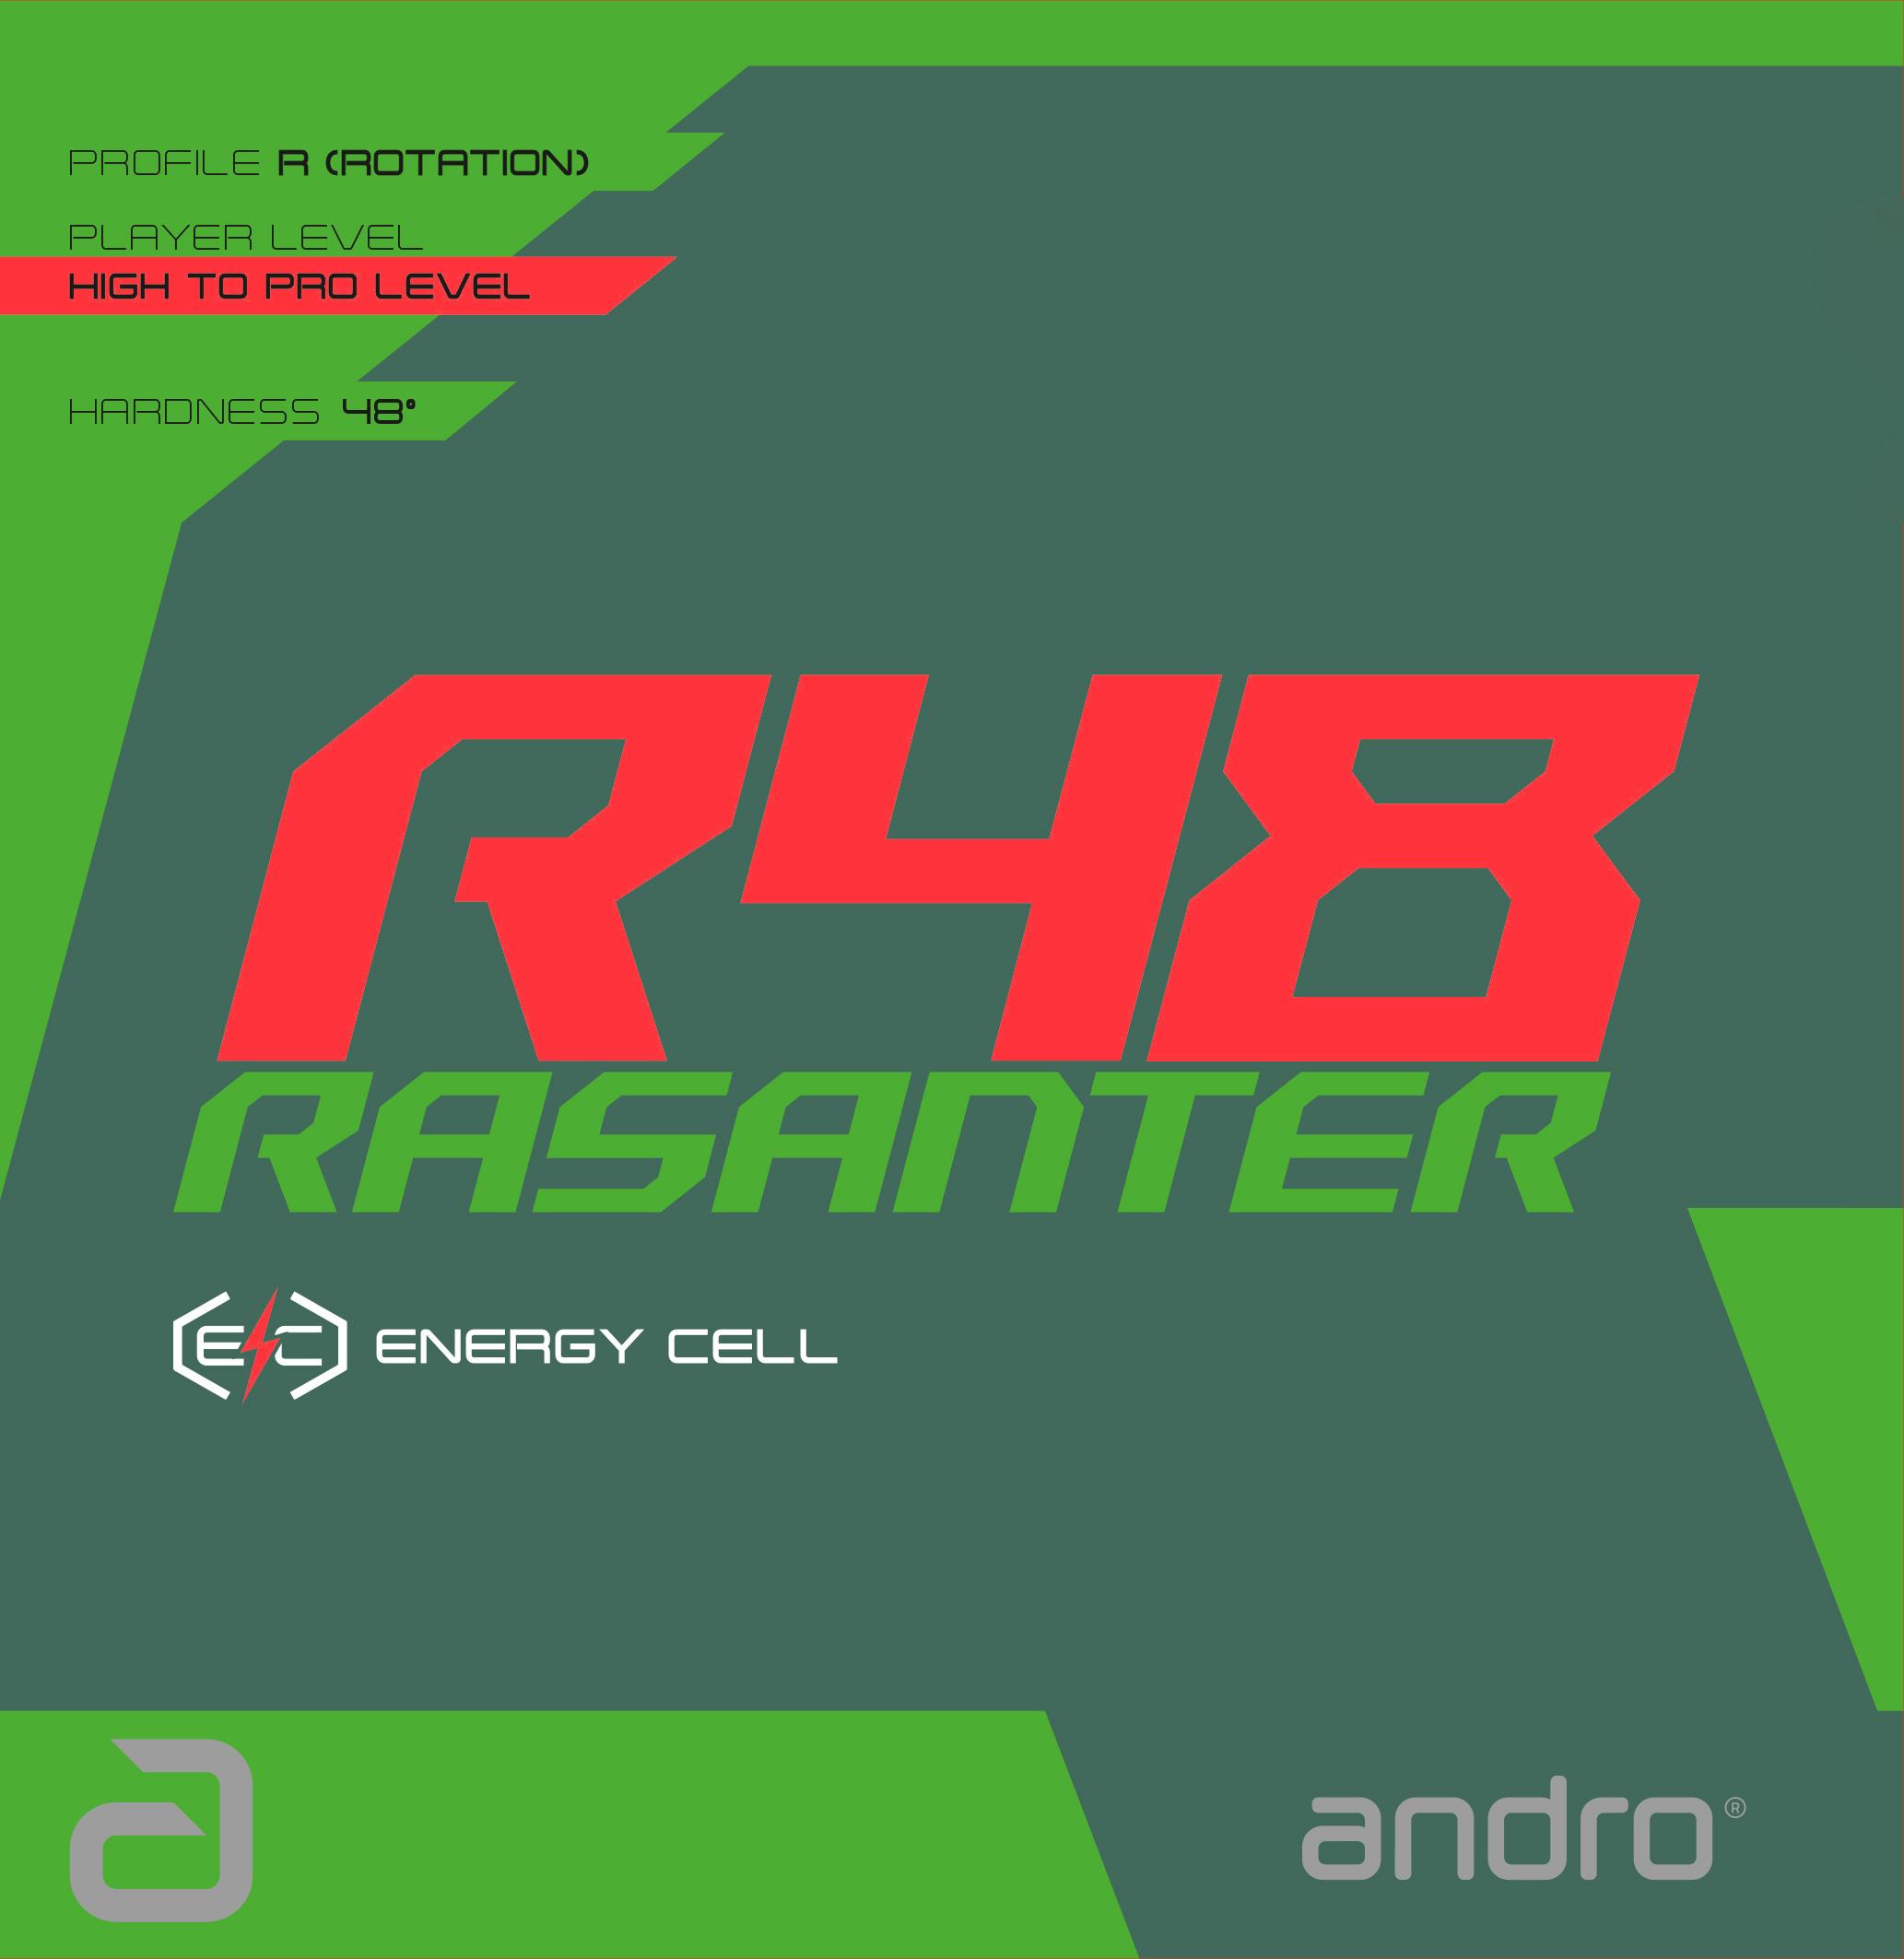 androRASANTER-R48